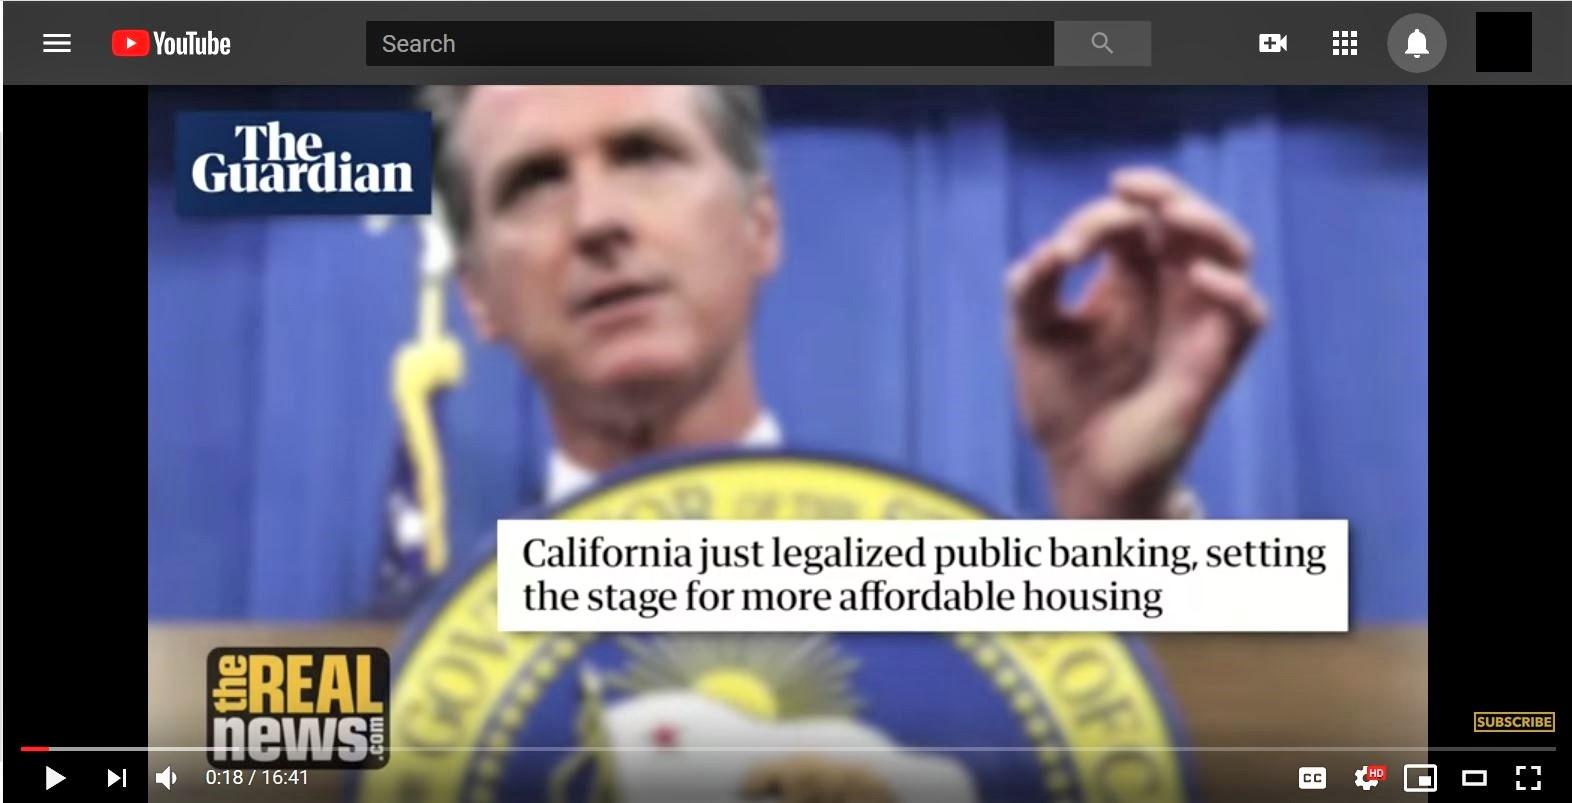 Gov Newsom Legalized Public Banking